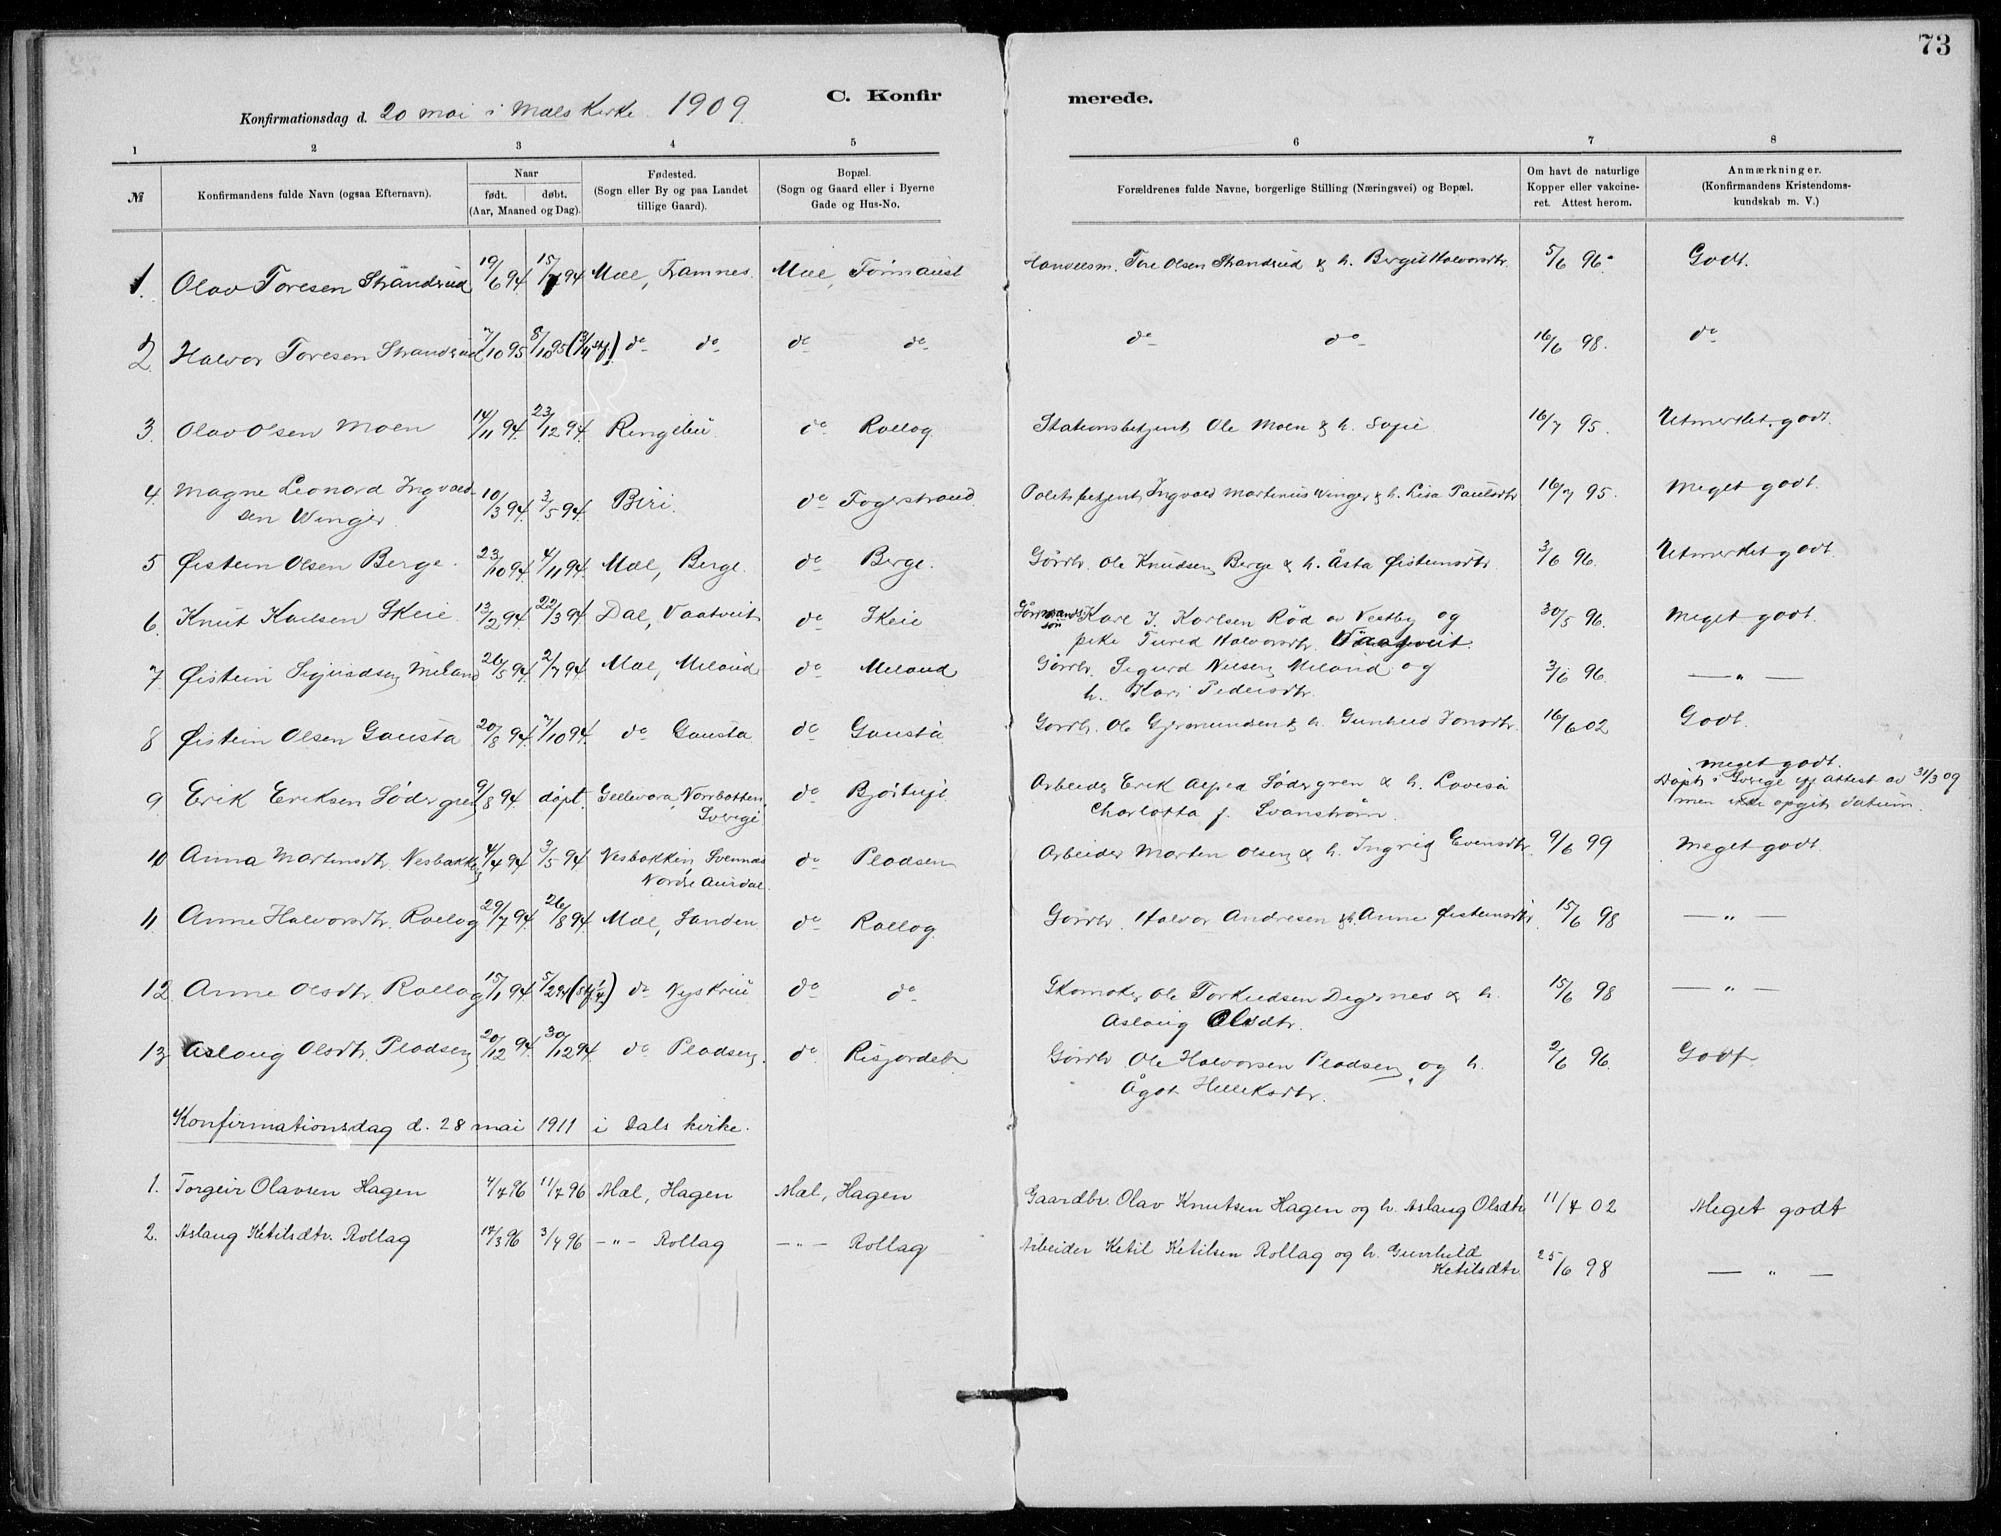 SAKO, Tinn kirkebøker, F/Fb/L0002: Ministerialbok nr. II 2, 1878-1917, s. 73